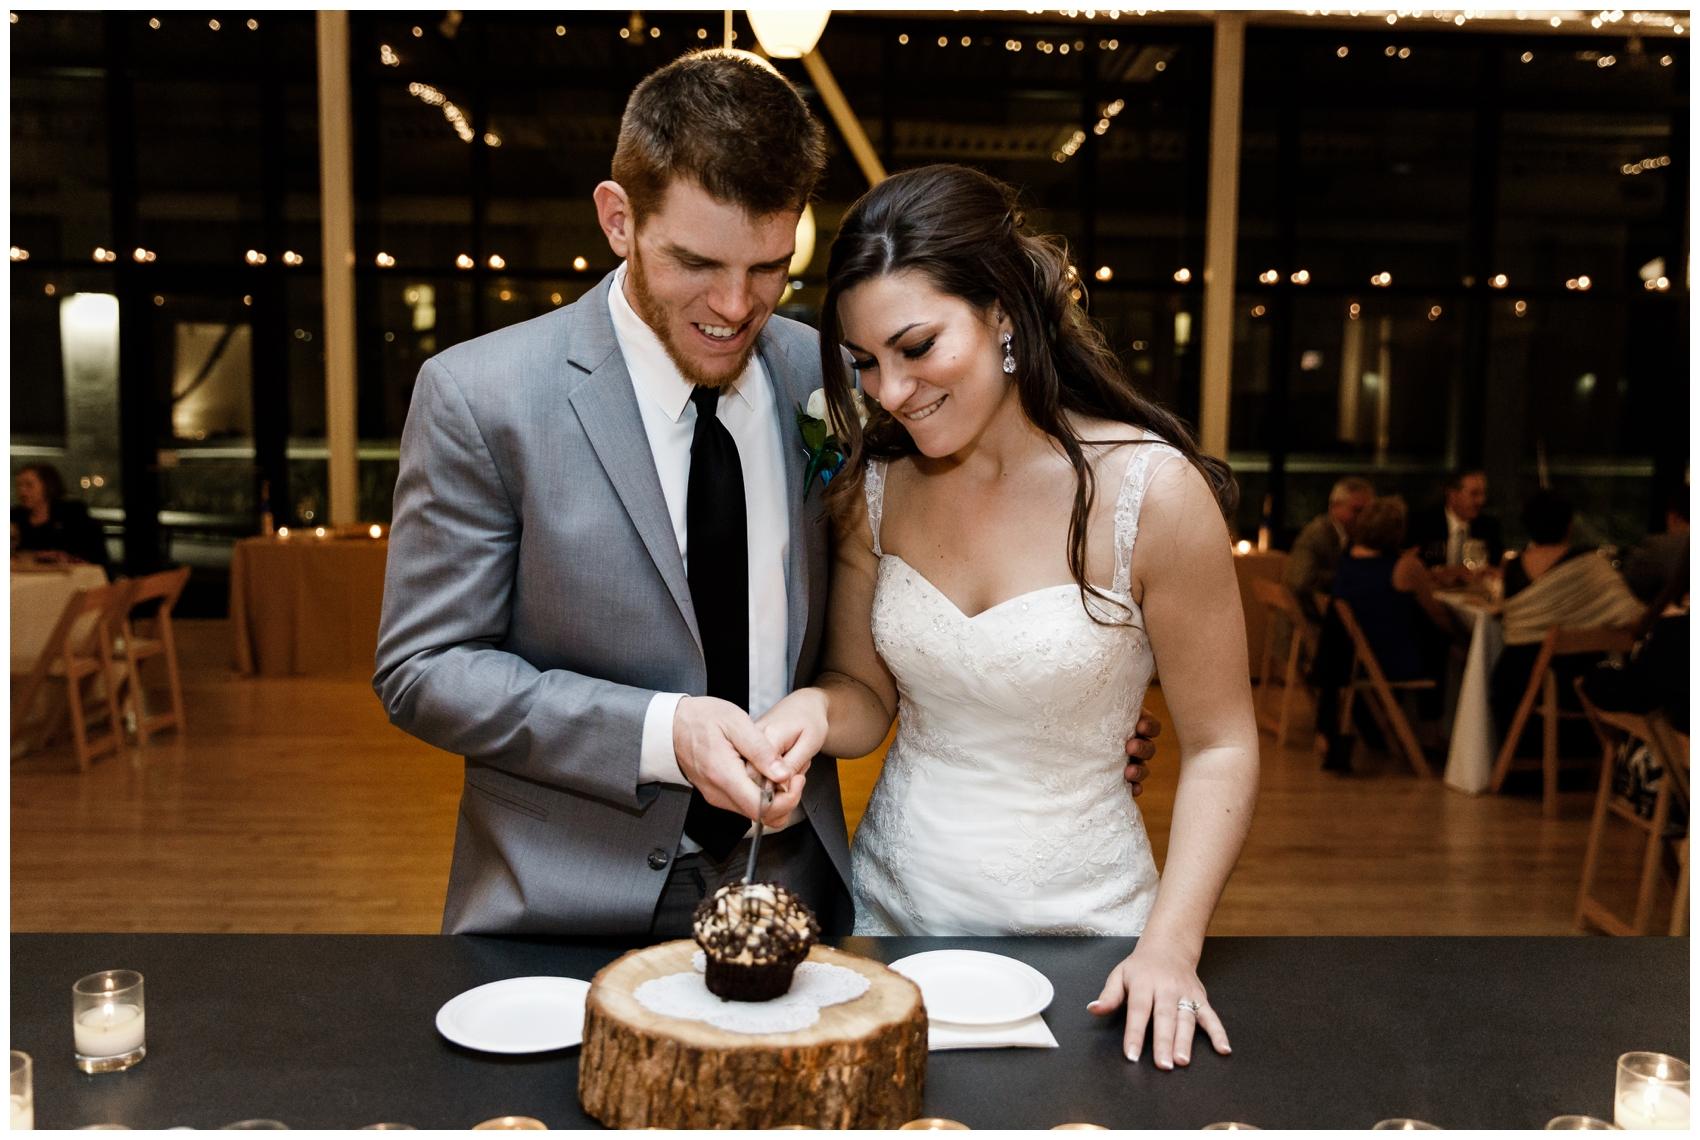 wedding cake cutting at Chicago's Greenhouse Loft